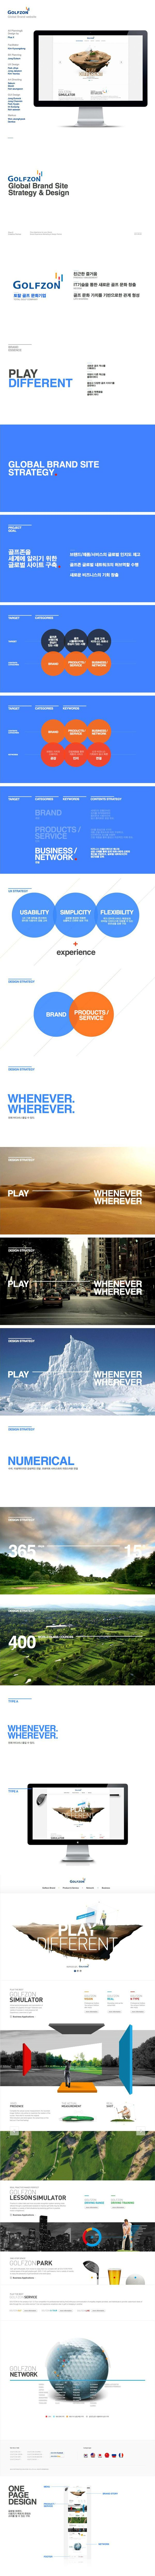 GolfZone Global Website Design on Behance